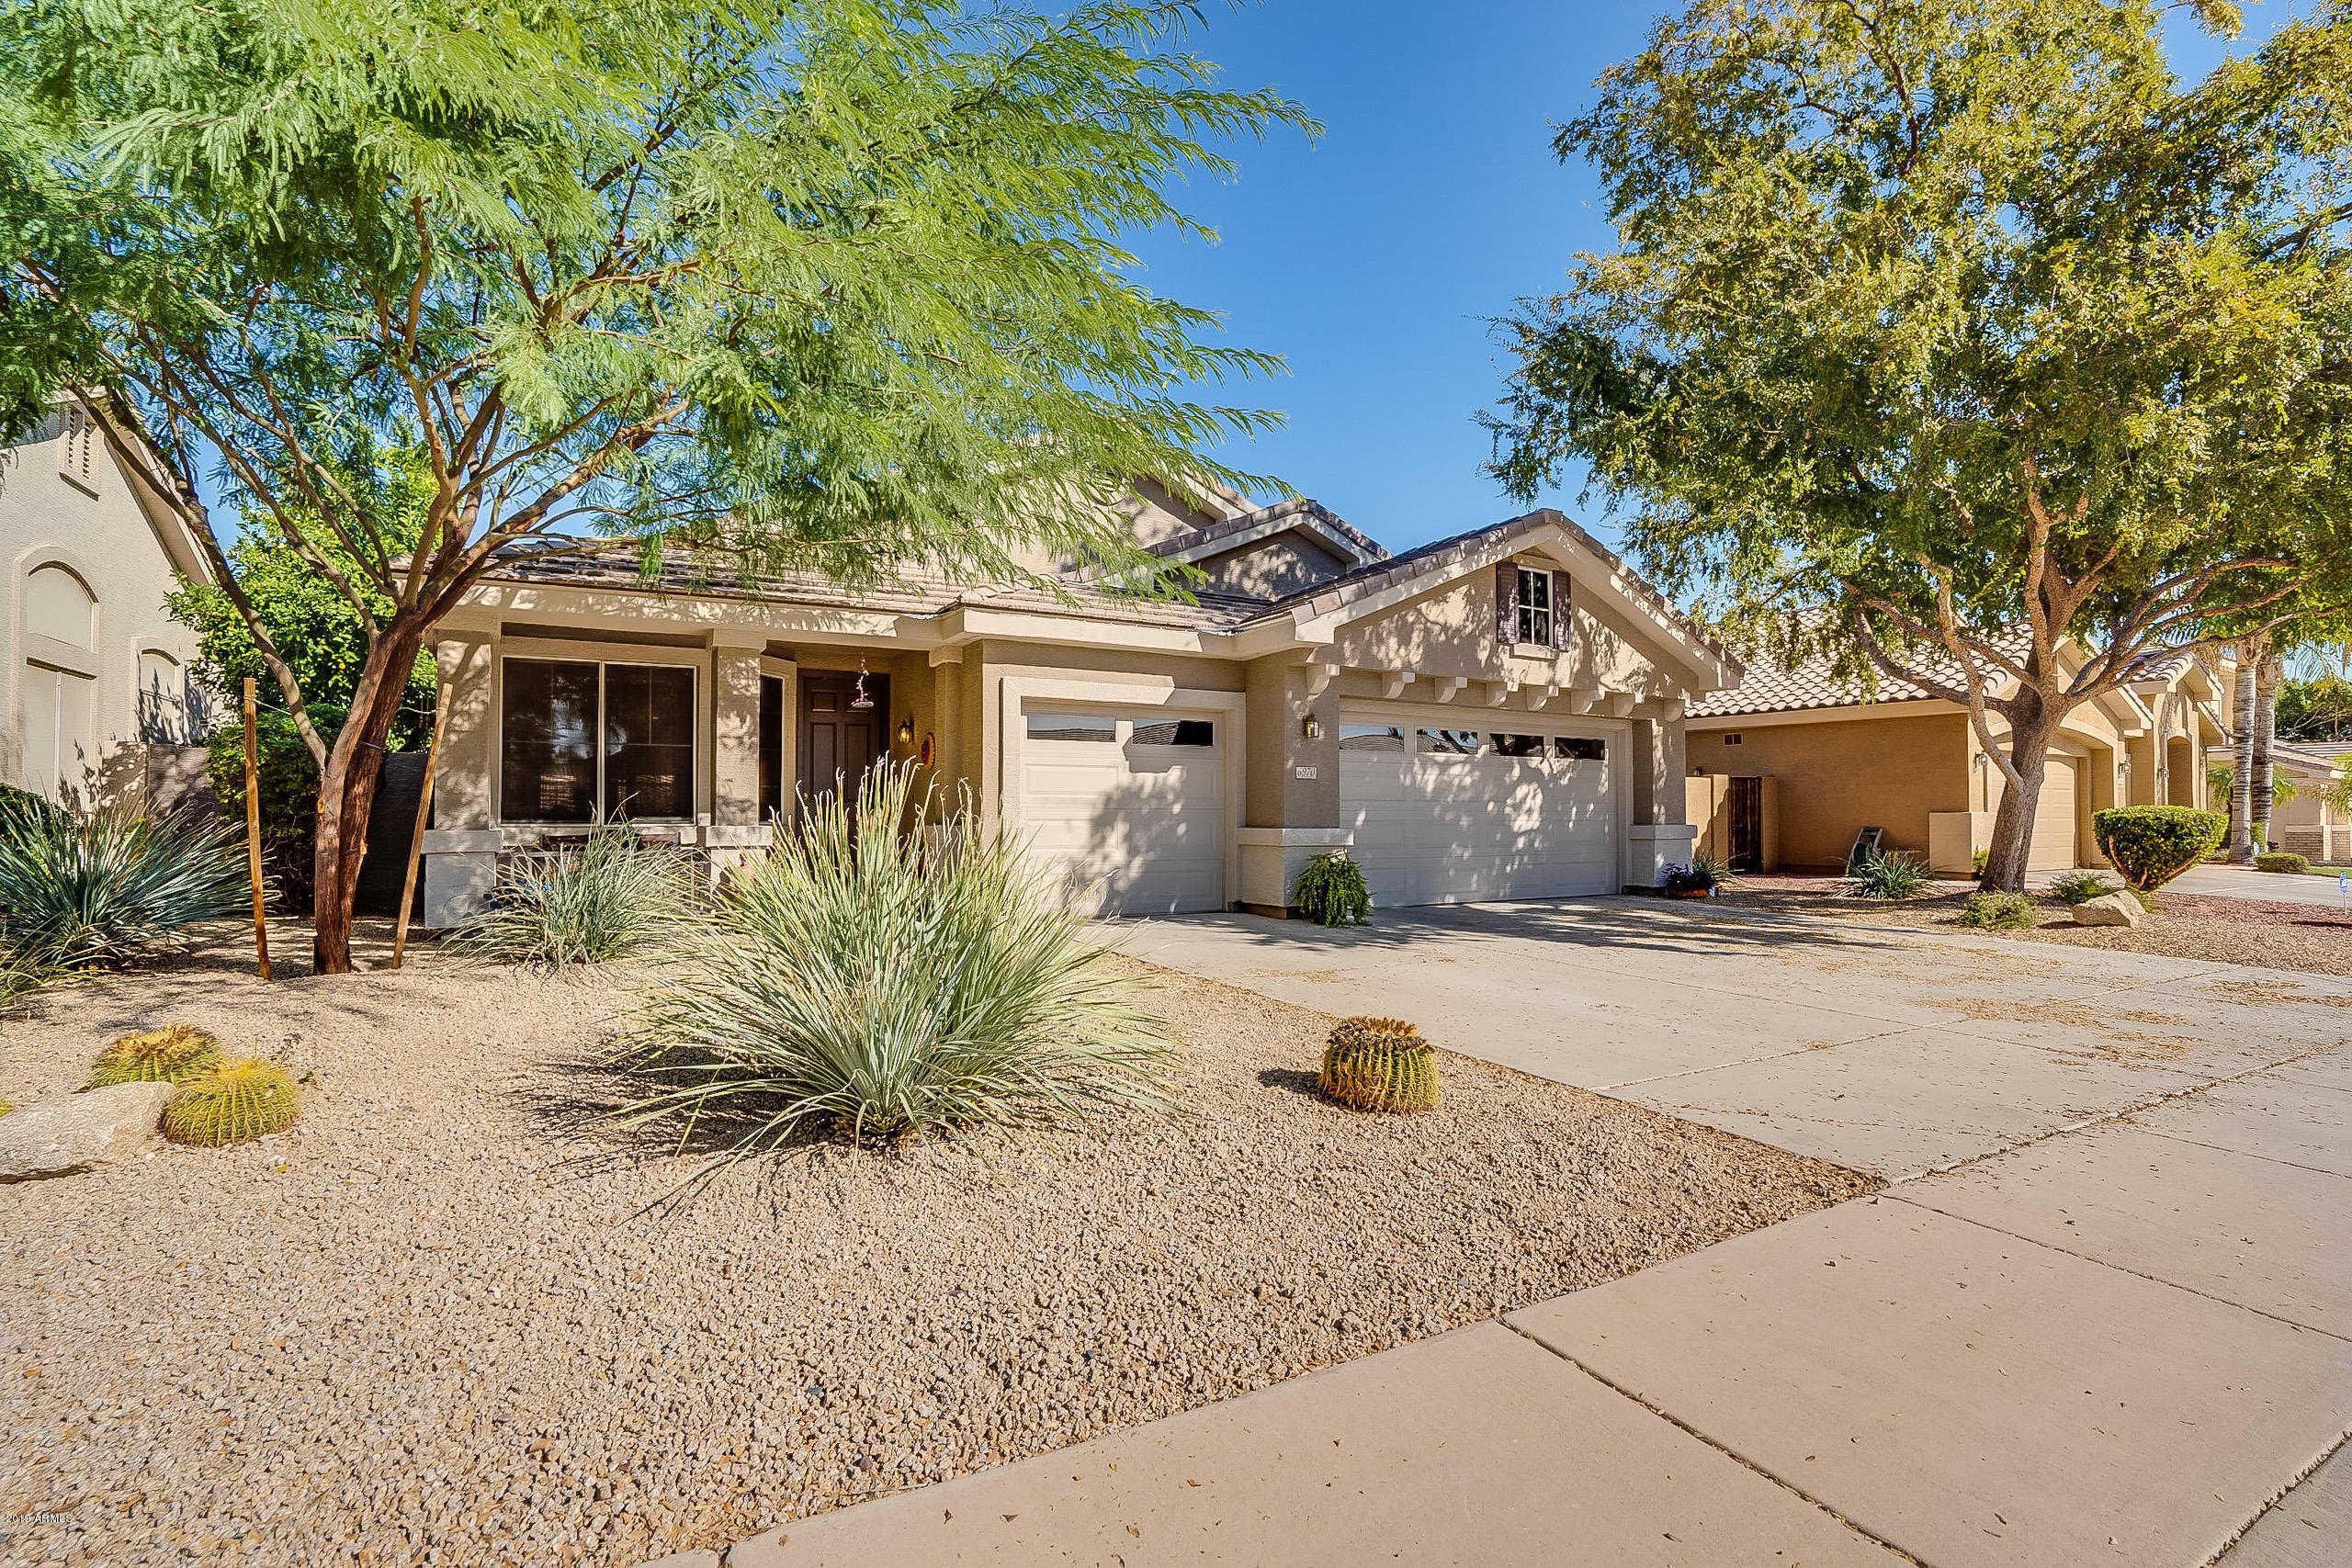 $374,900 - 4Br/2Ba - Home for Sale in Fulton Homes At Sierra Verde, Glendale